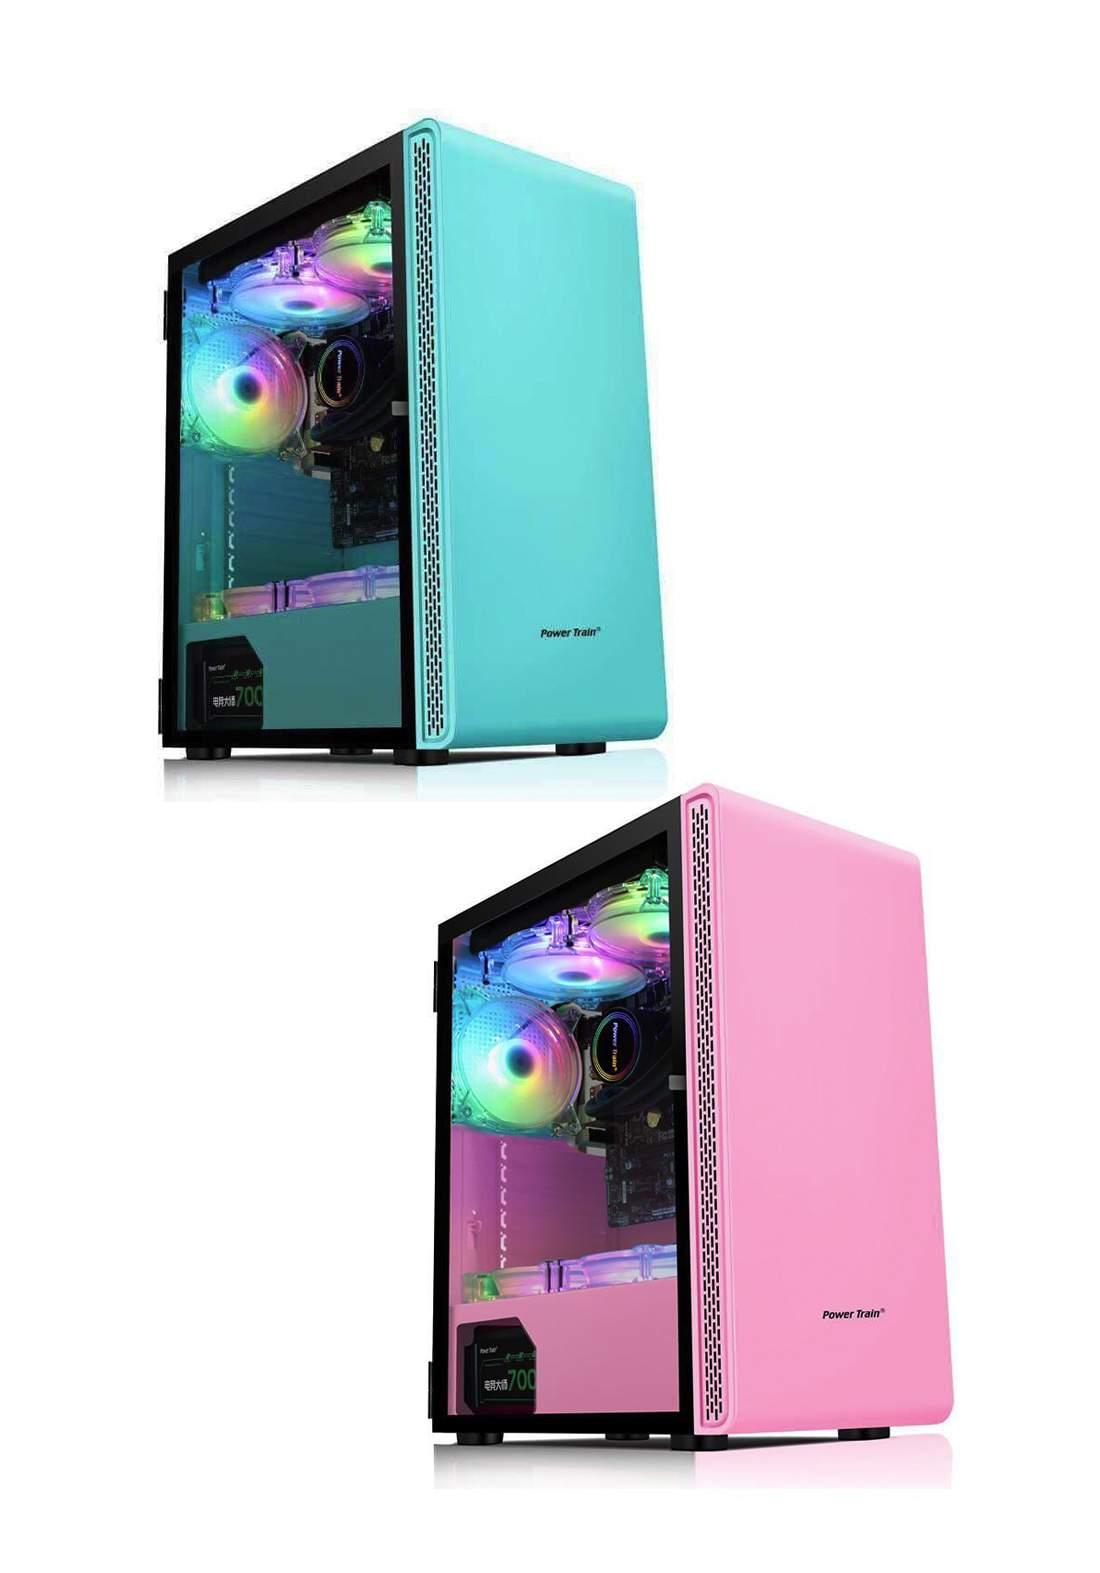 Power Train5 Gamer Atx Power Train Rain Daofeng 5 كيس حاسبة